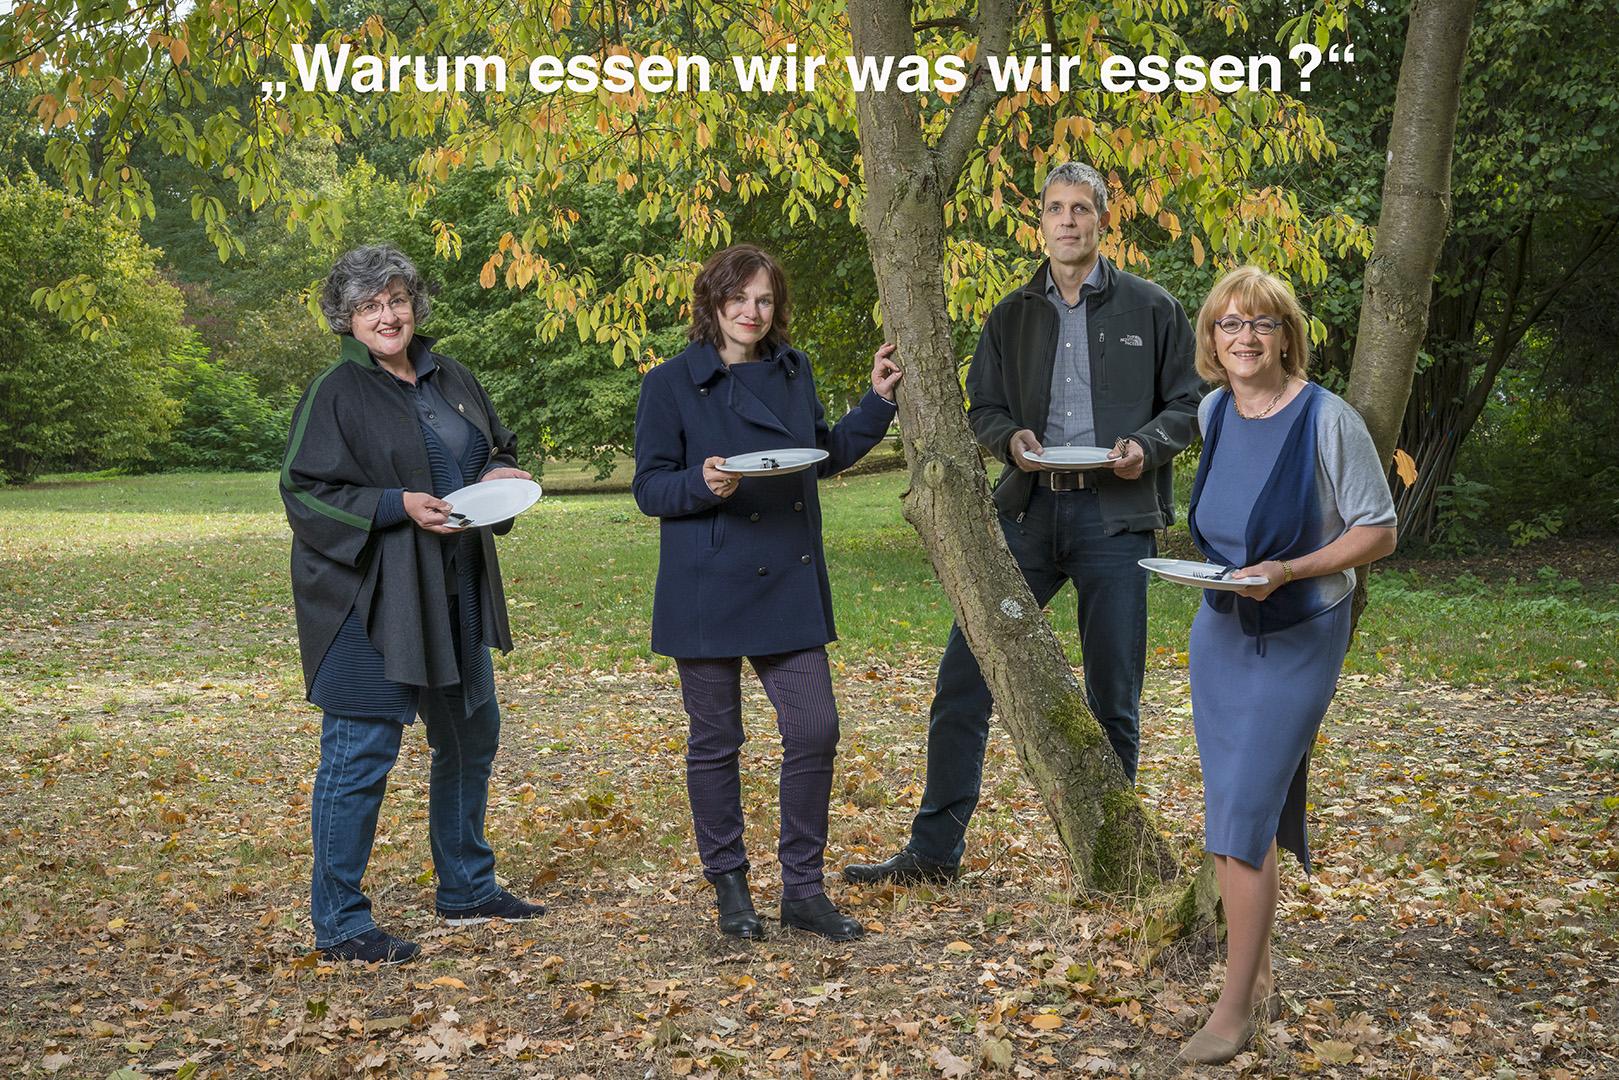 Deutsches Institut für Ernährungsforschung (DifE), Universität Potsdam (UP), Charité, Forschungszentrum Jülich, NutriAct